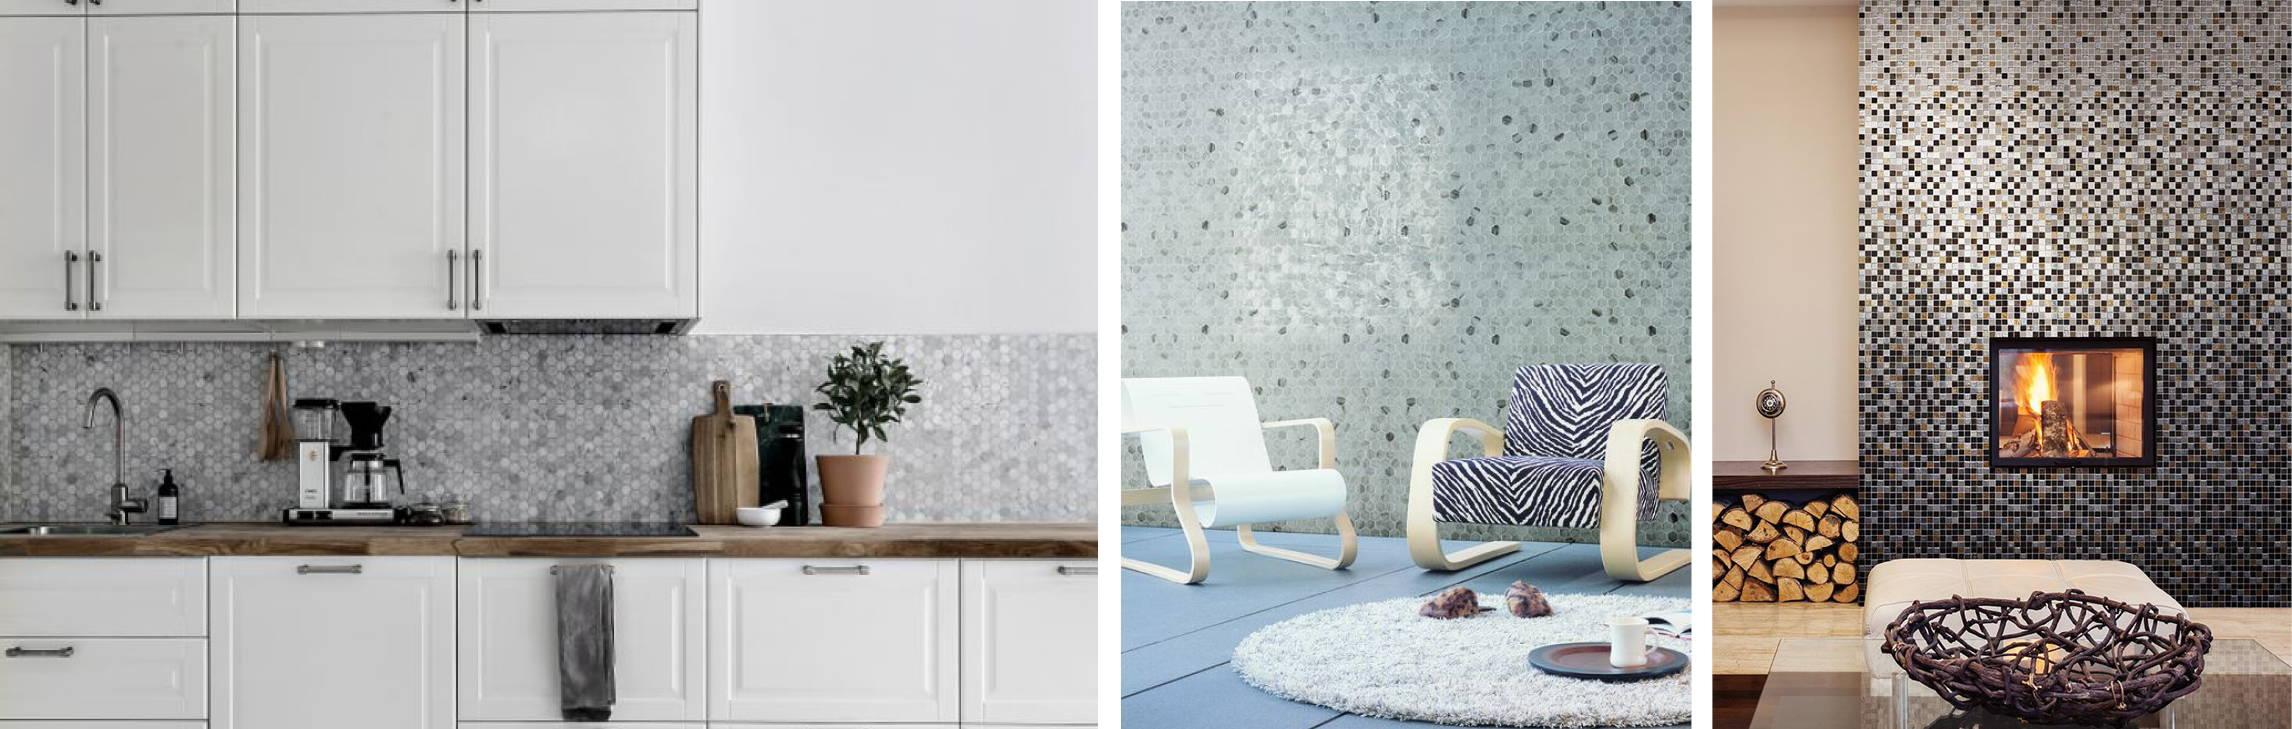 Mosaik - Kakel & Klinker - Stuvbutiken